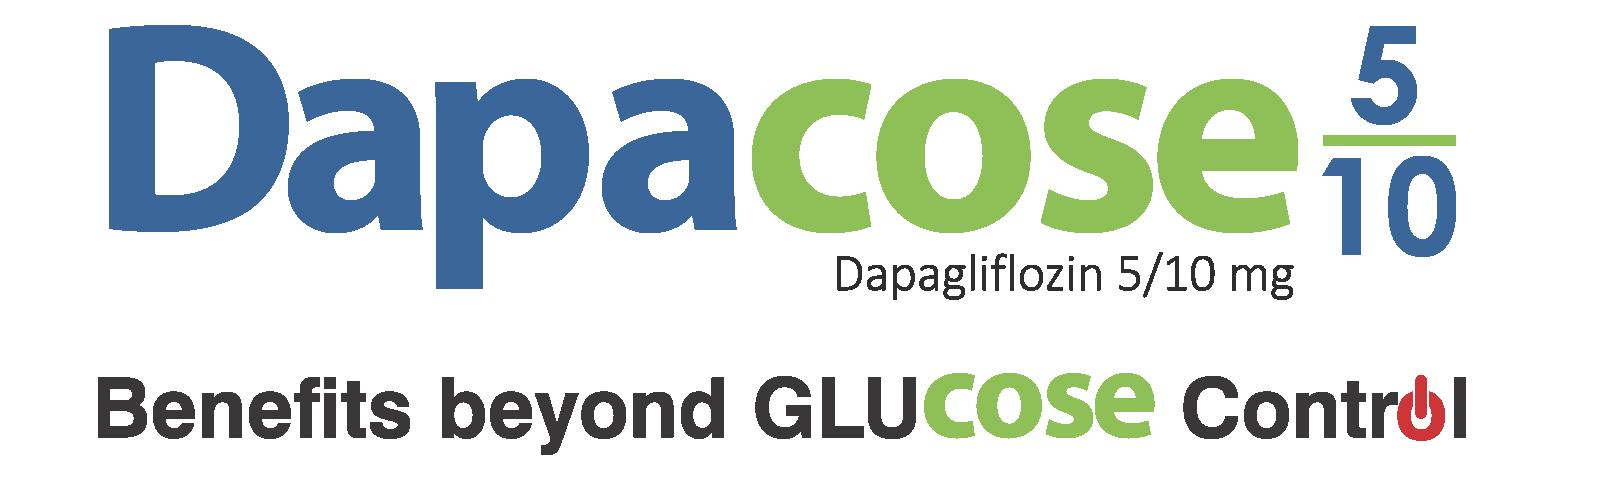 DAPACOSE